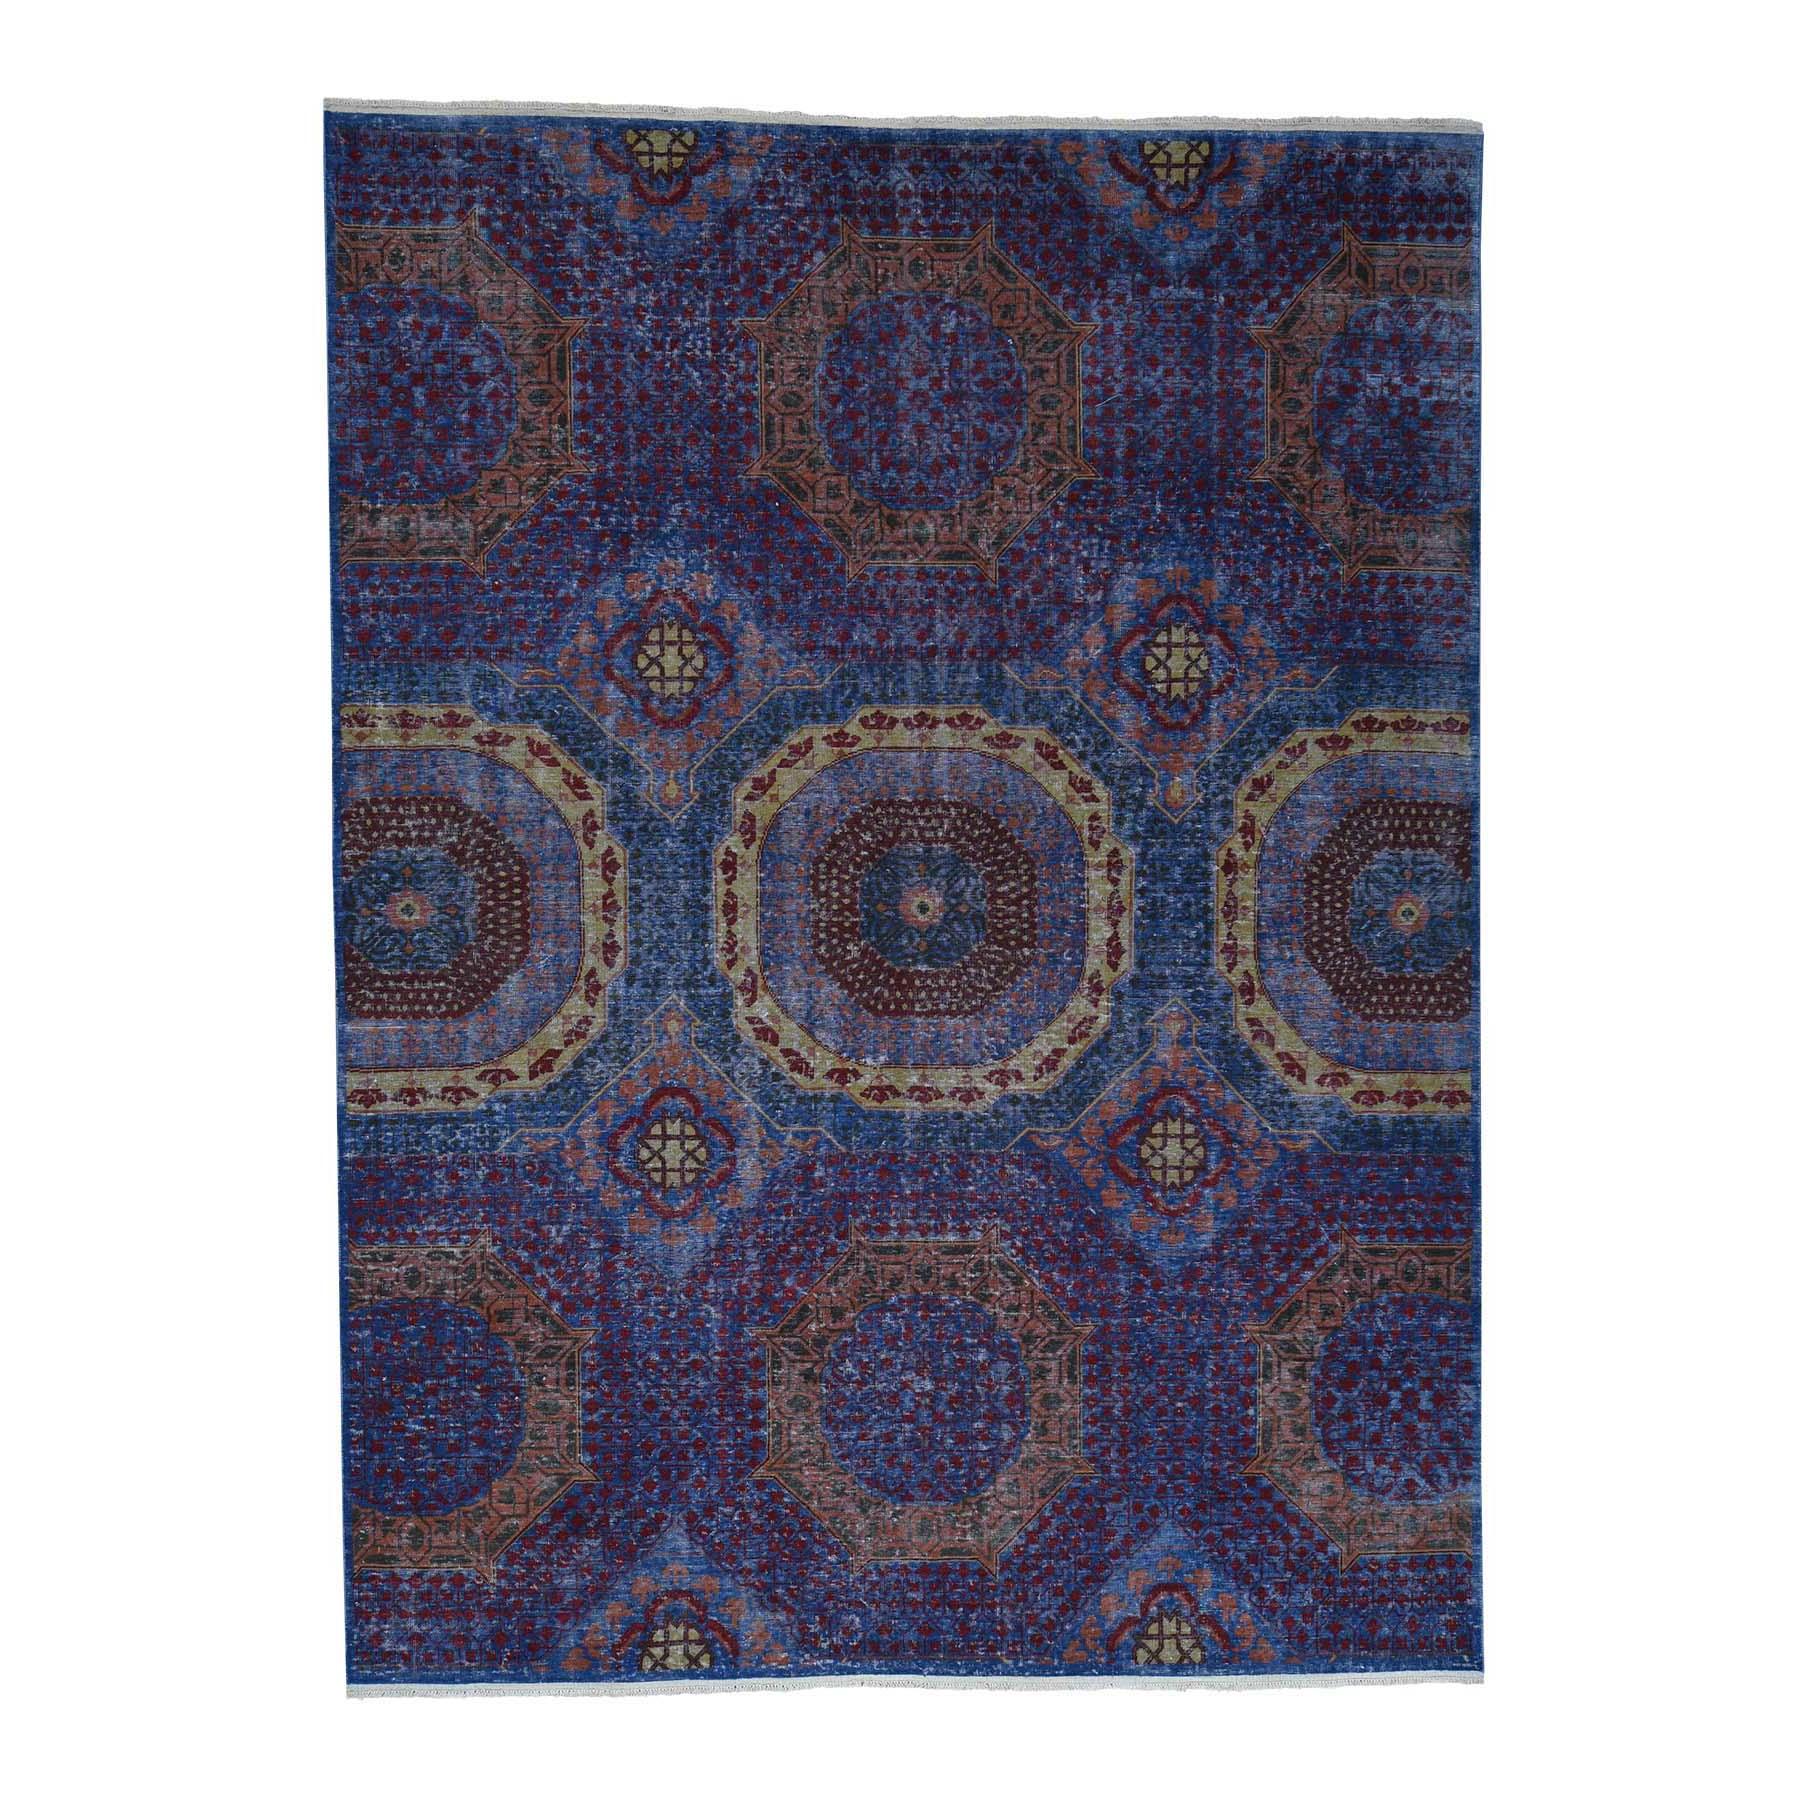 9'X12' Vintage Pre-Historical Mamluk Design Zero Pile Oxidized Wool Oriental Rug moad0e97